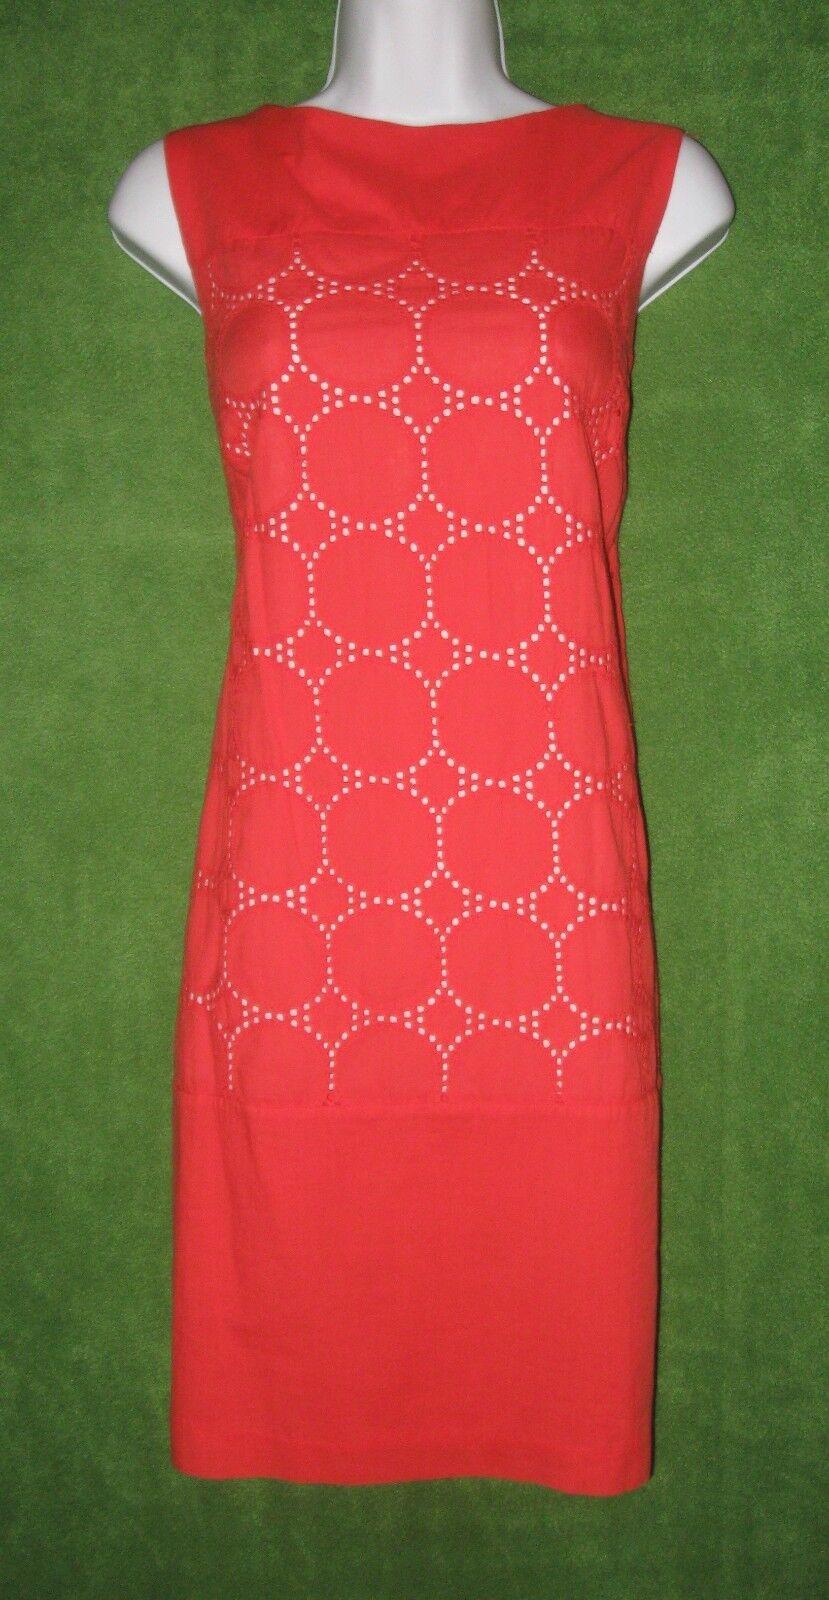 Studio One orange Cotton Eyelet Crochet Dot Causal Shift Dress 10  79 MISC